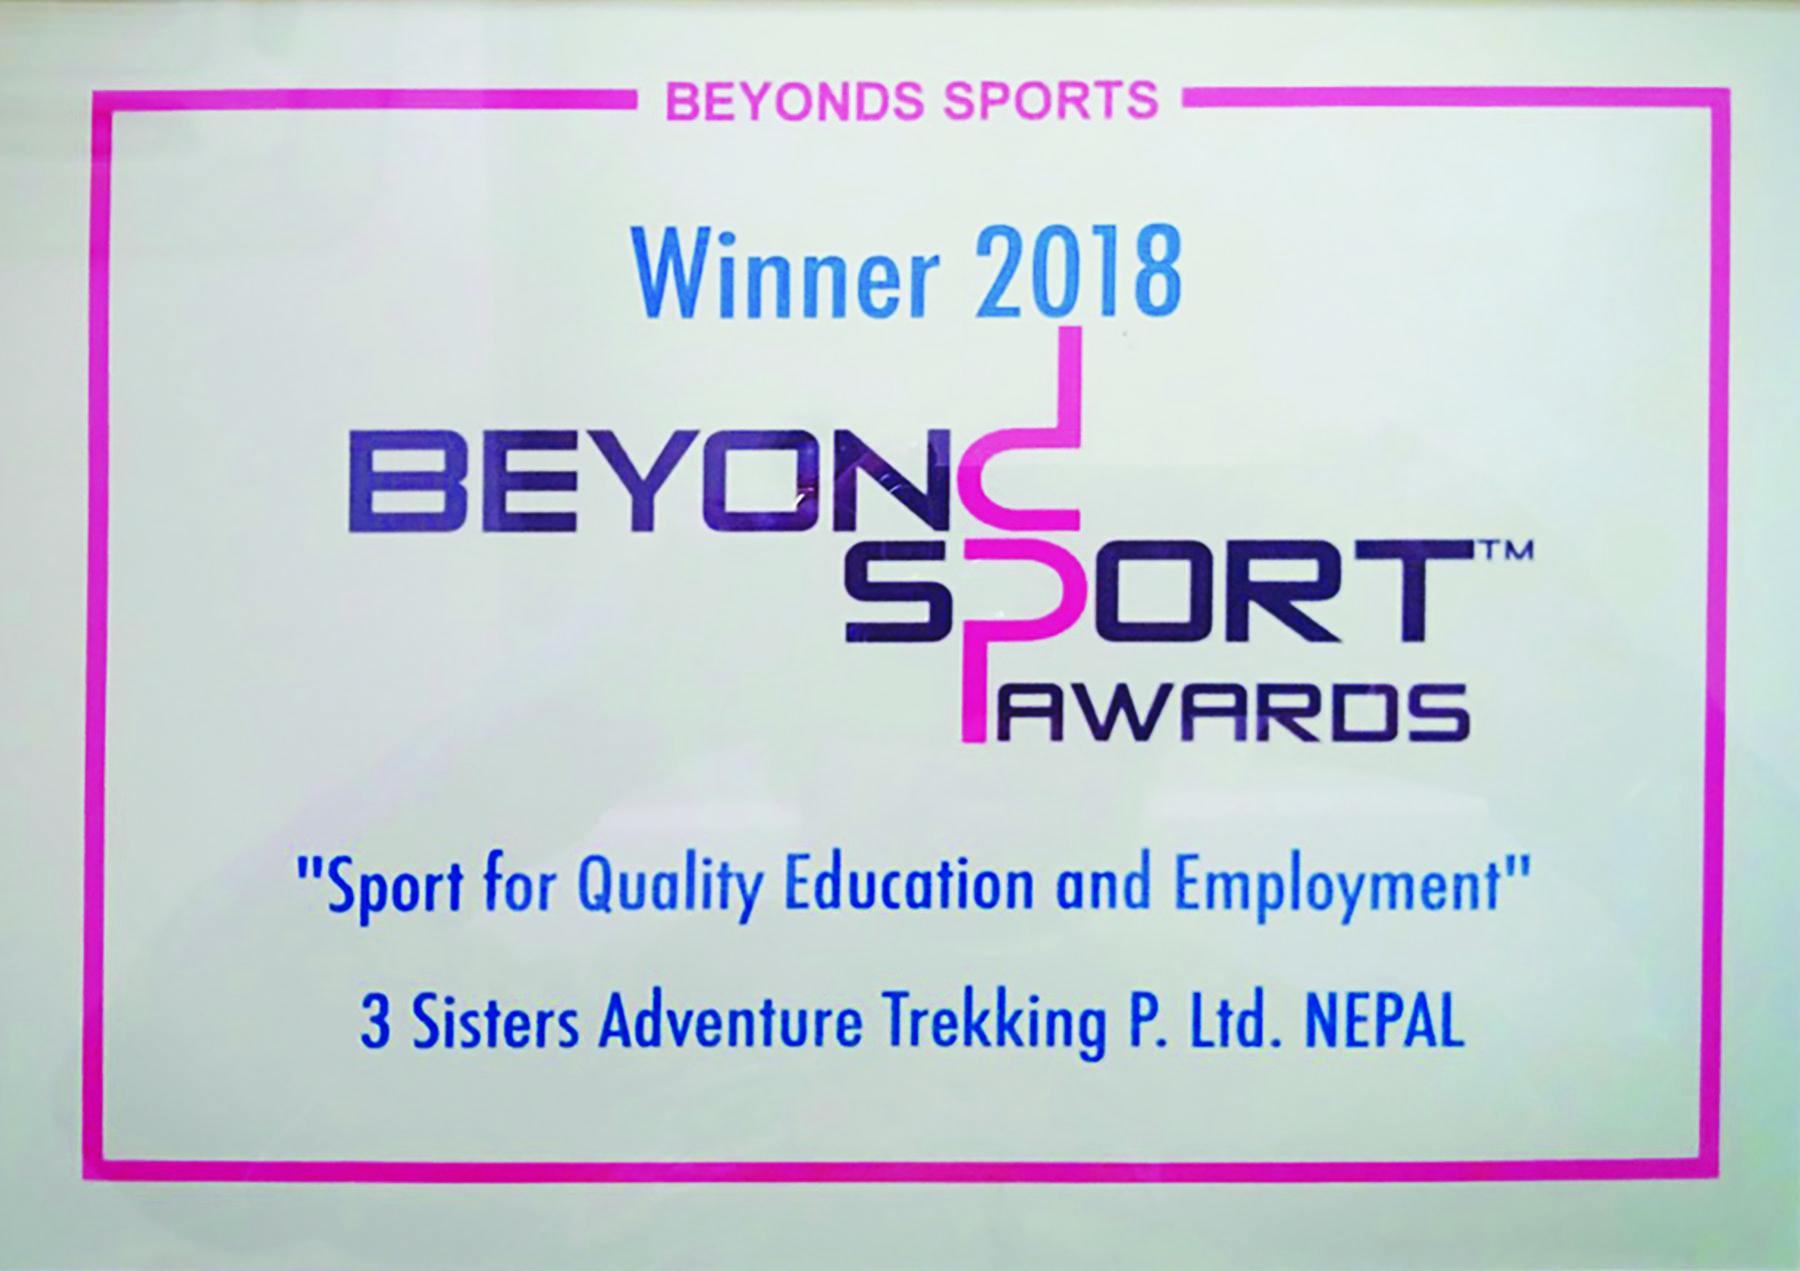 beyond sports award 2018